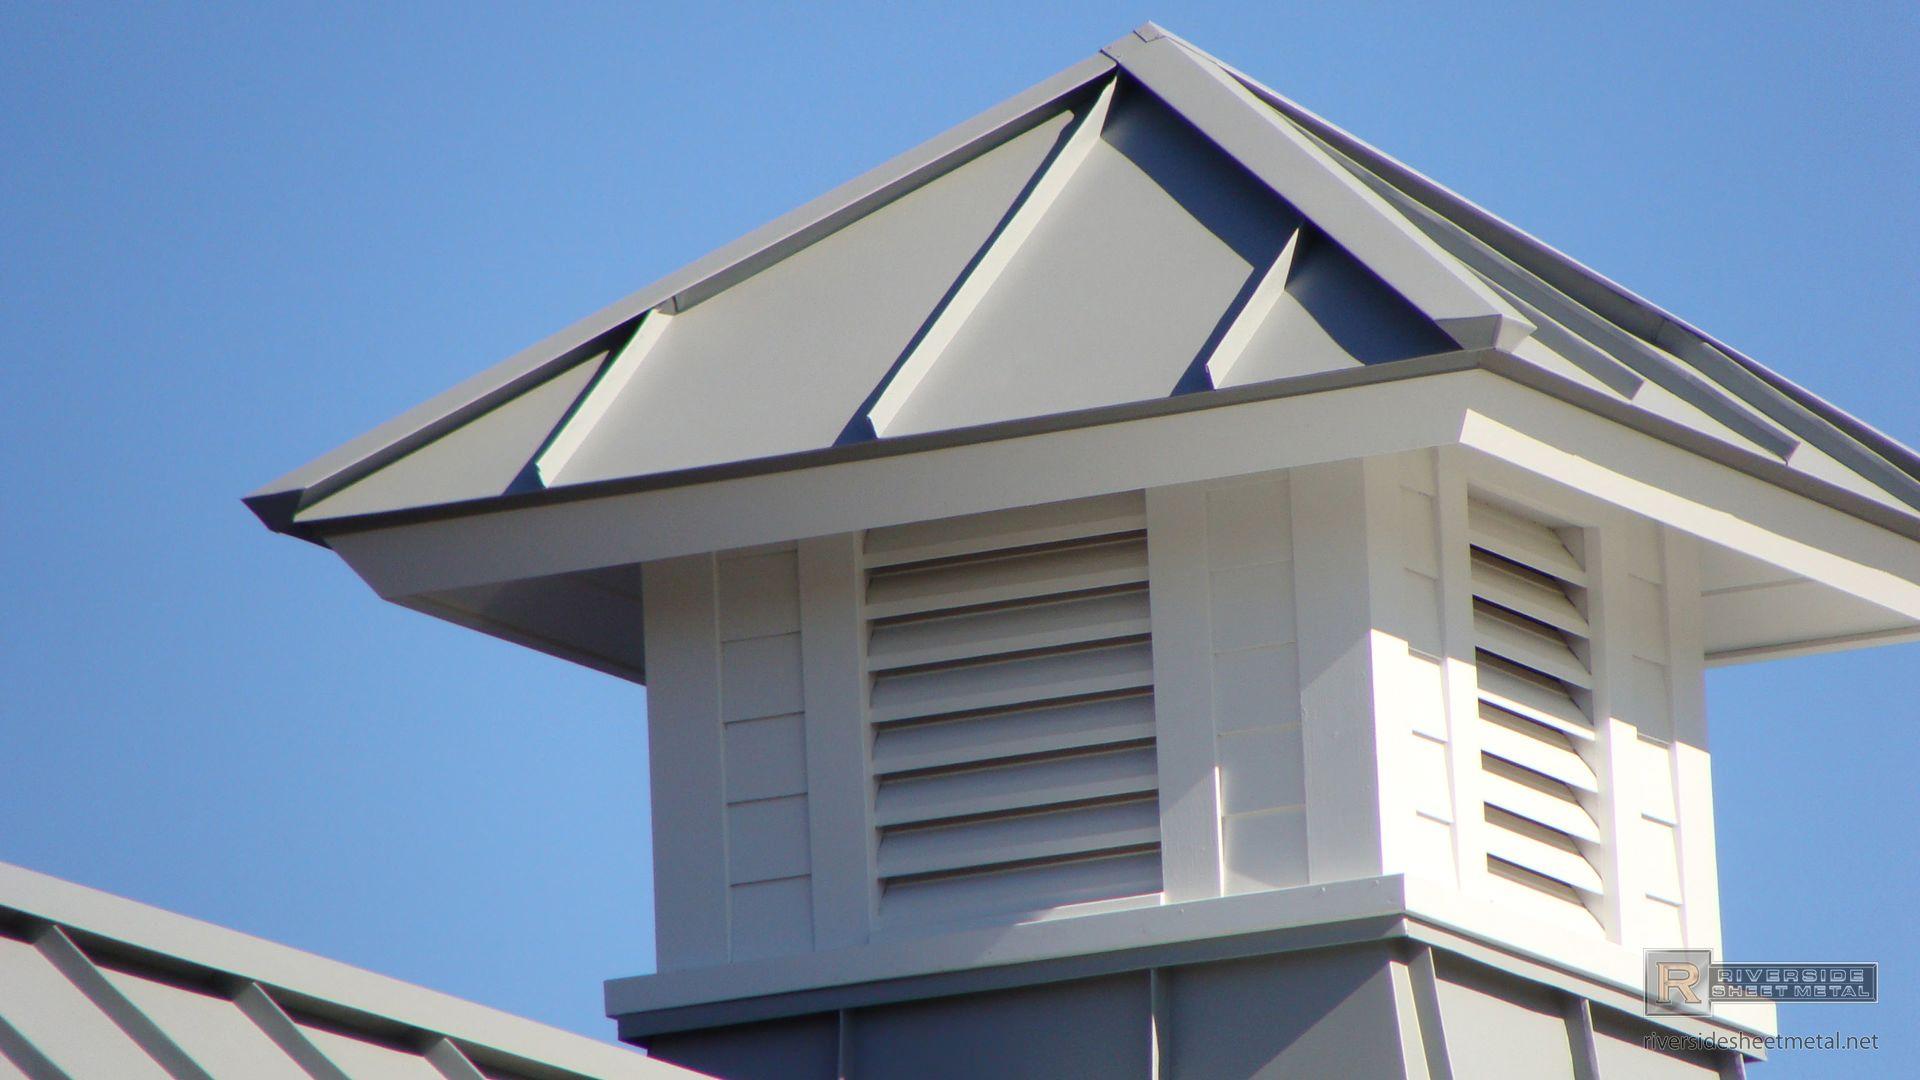 Dove Gray Standing Seam Metal Roofing Panels Riverside Aluminum Roof Panels Aluminum Roof Metal Roof